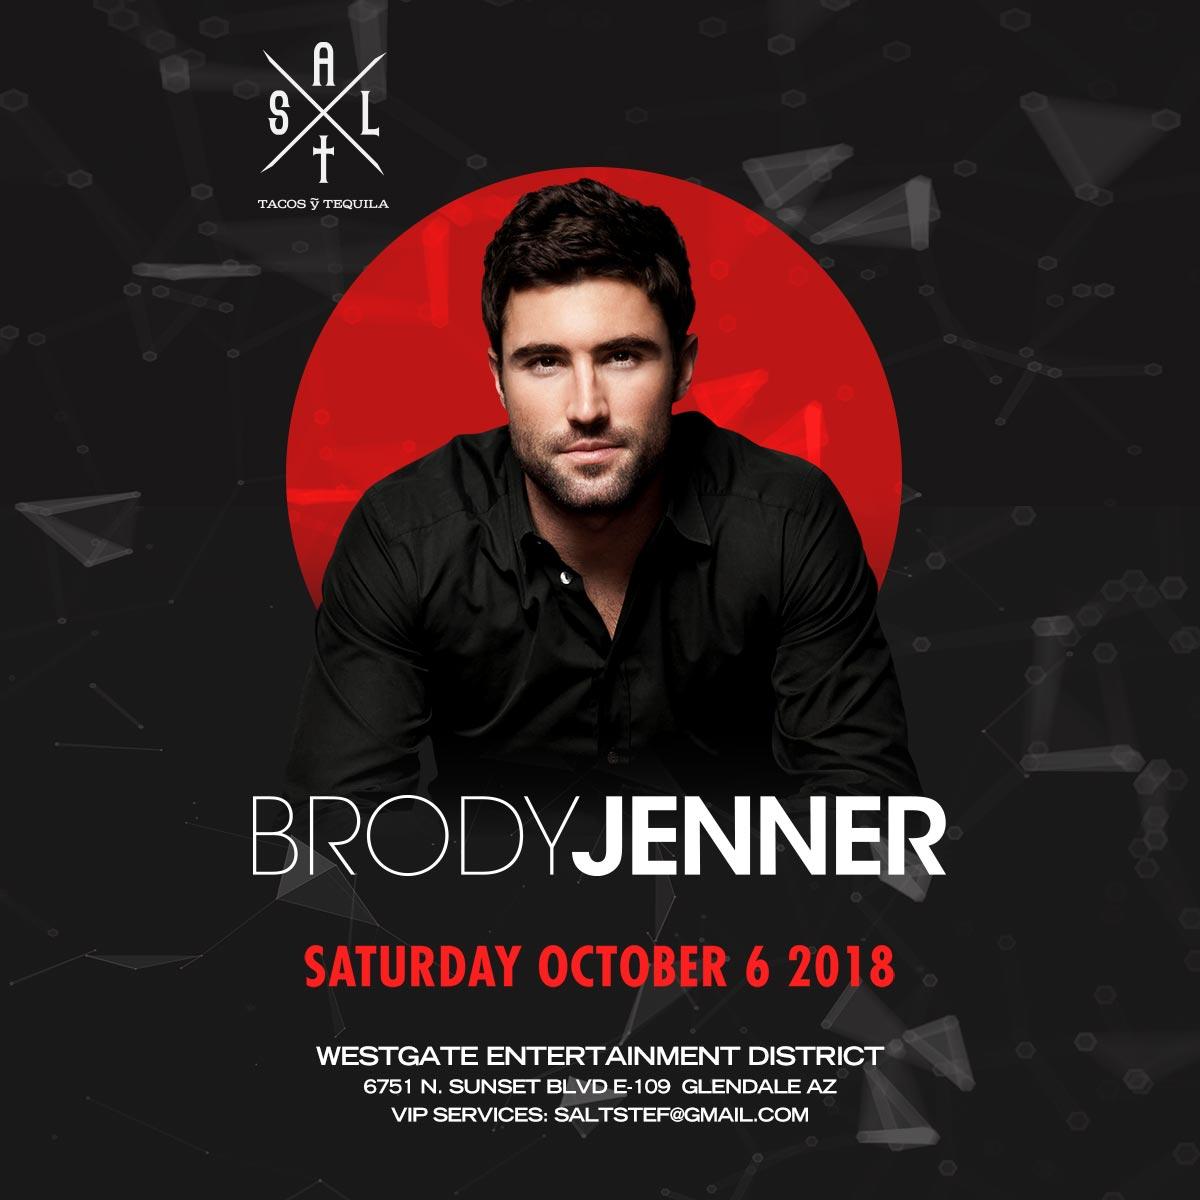 Flyer for Brody Jenner